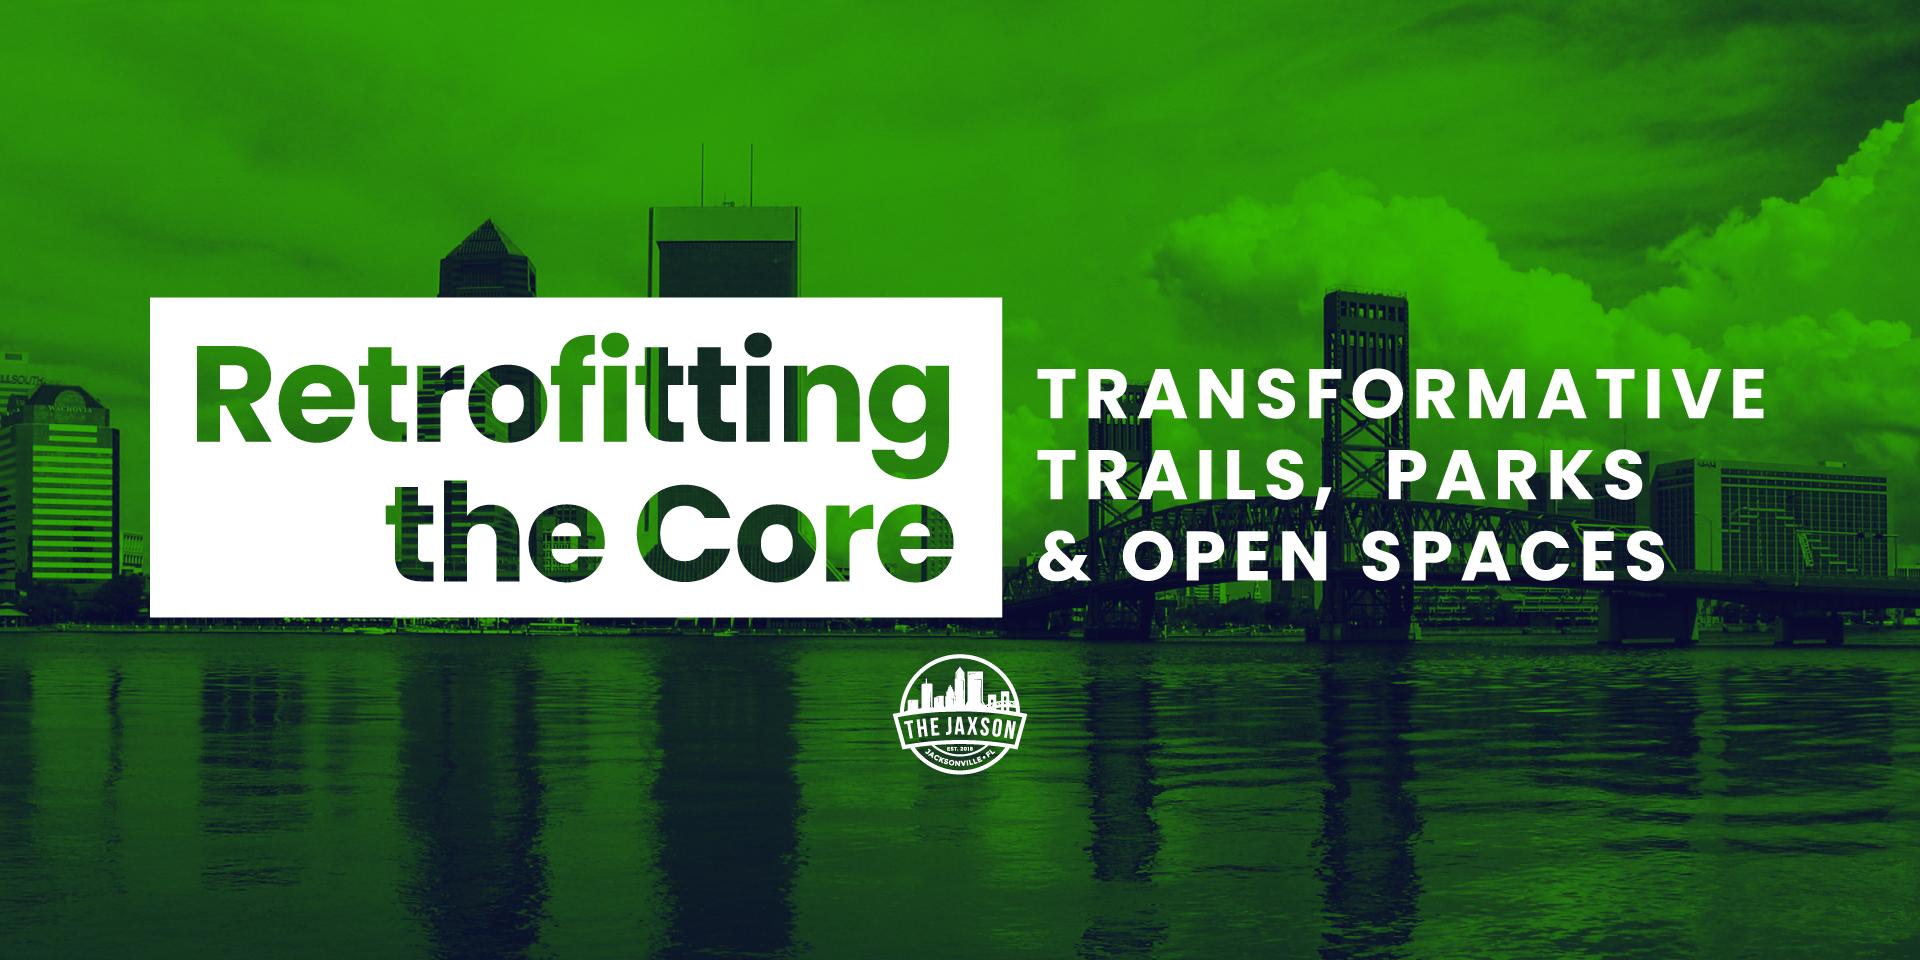 The Jaxson presents Retrofitting the Core: Transformative Trails, Parks & Open Spaces (Virtual)